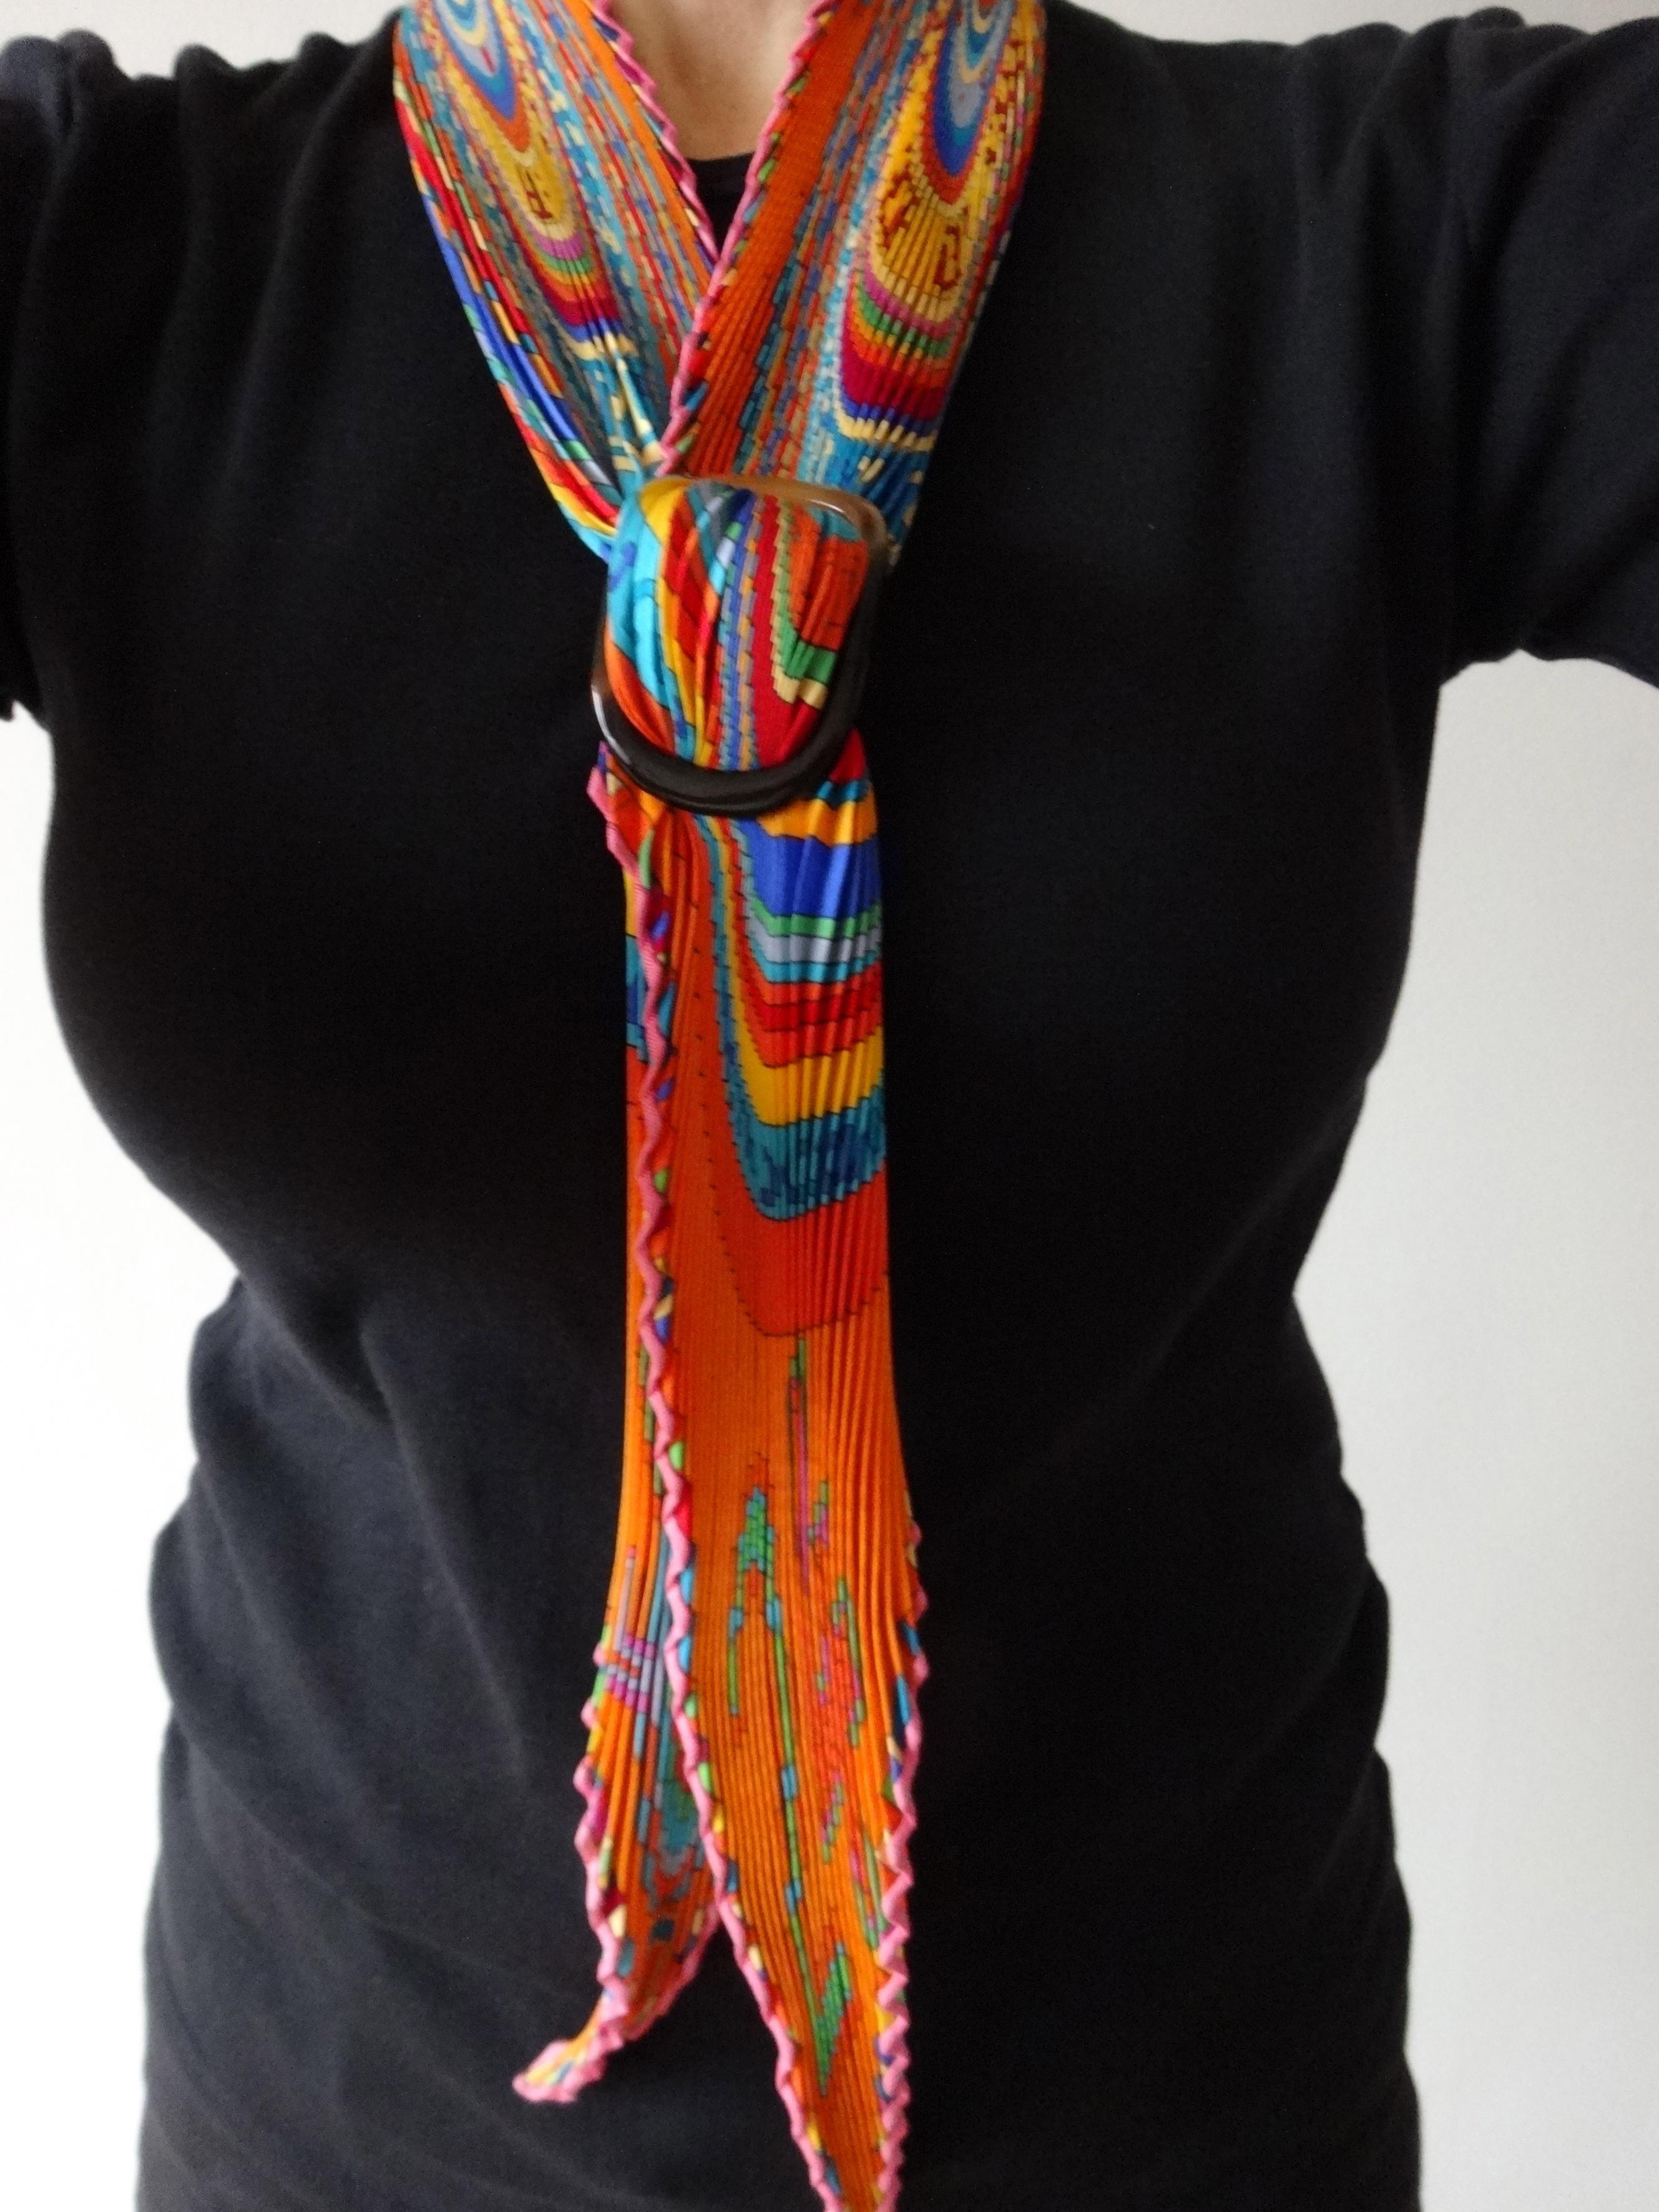 TohuBohu with MaiTai shawl-ring